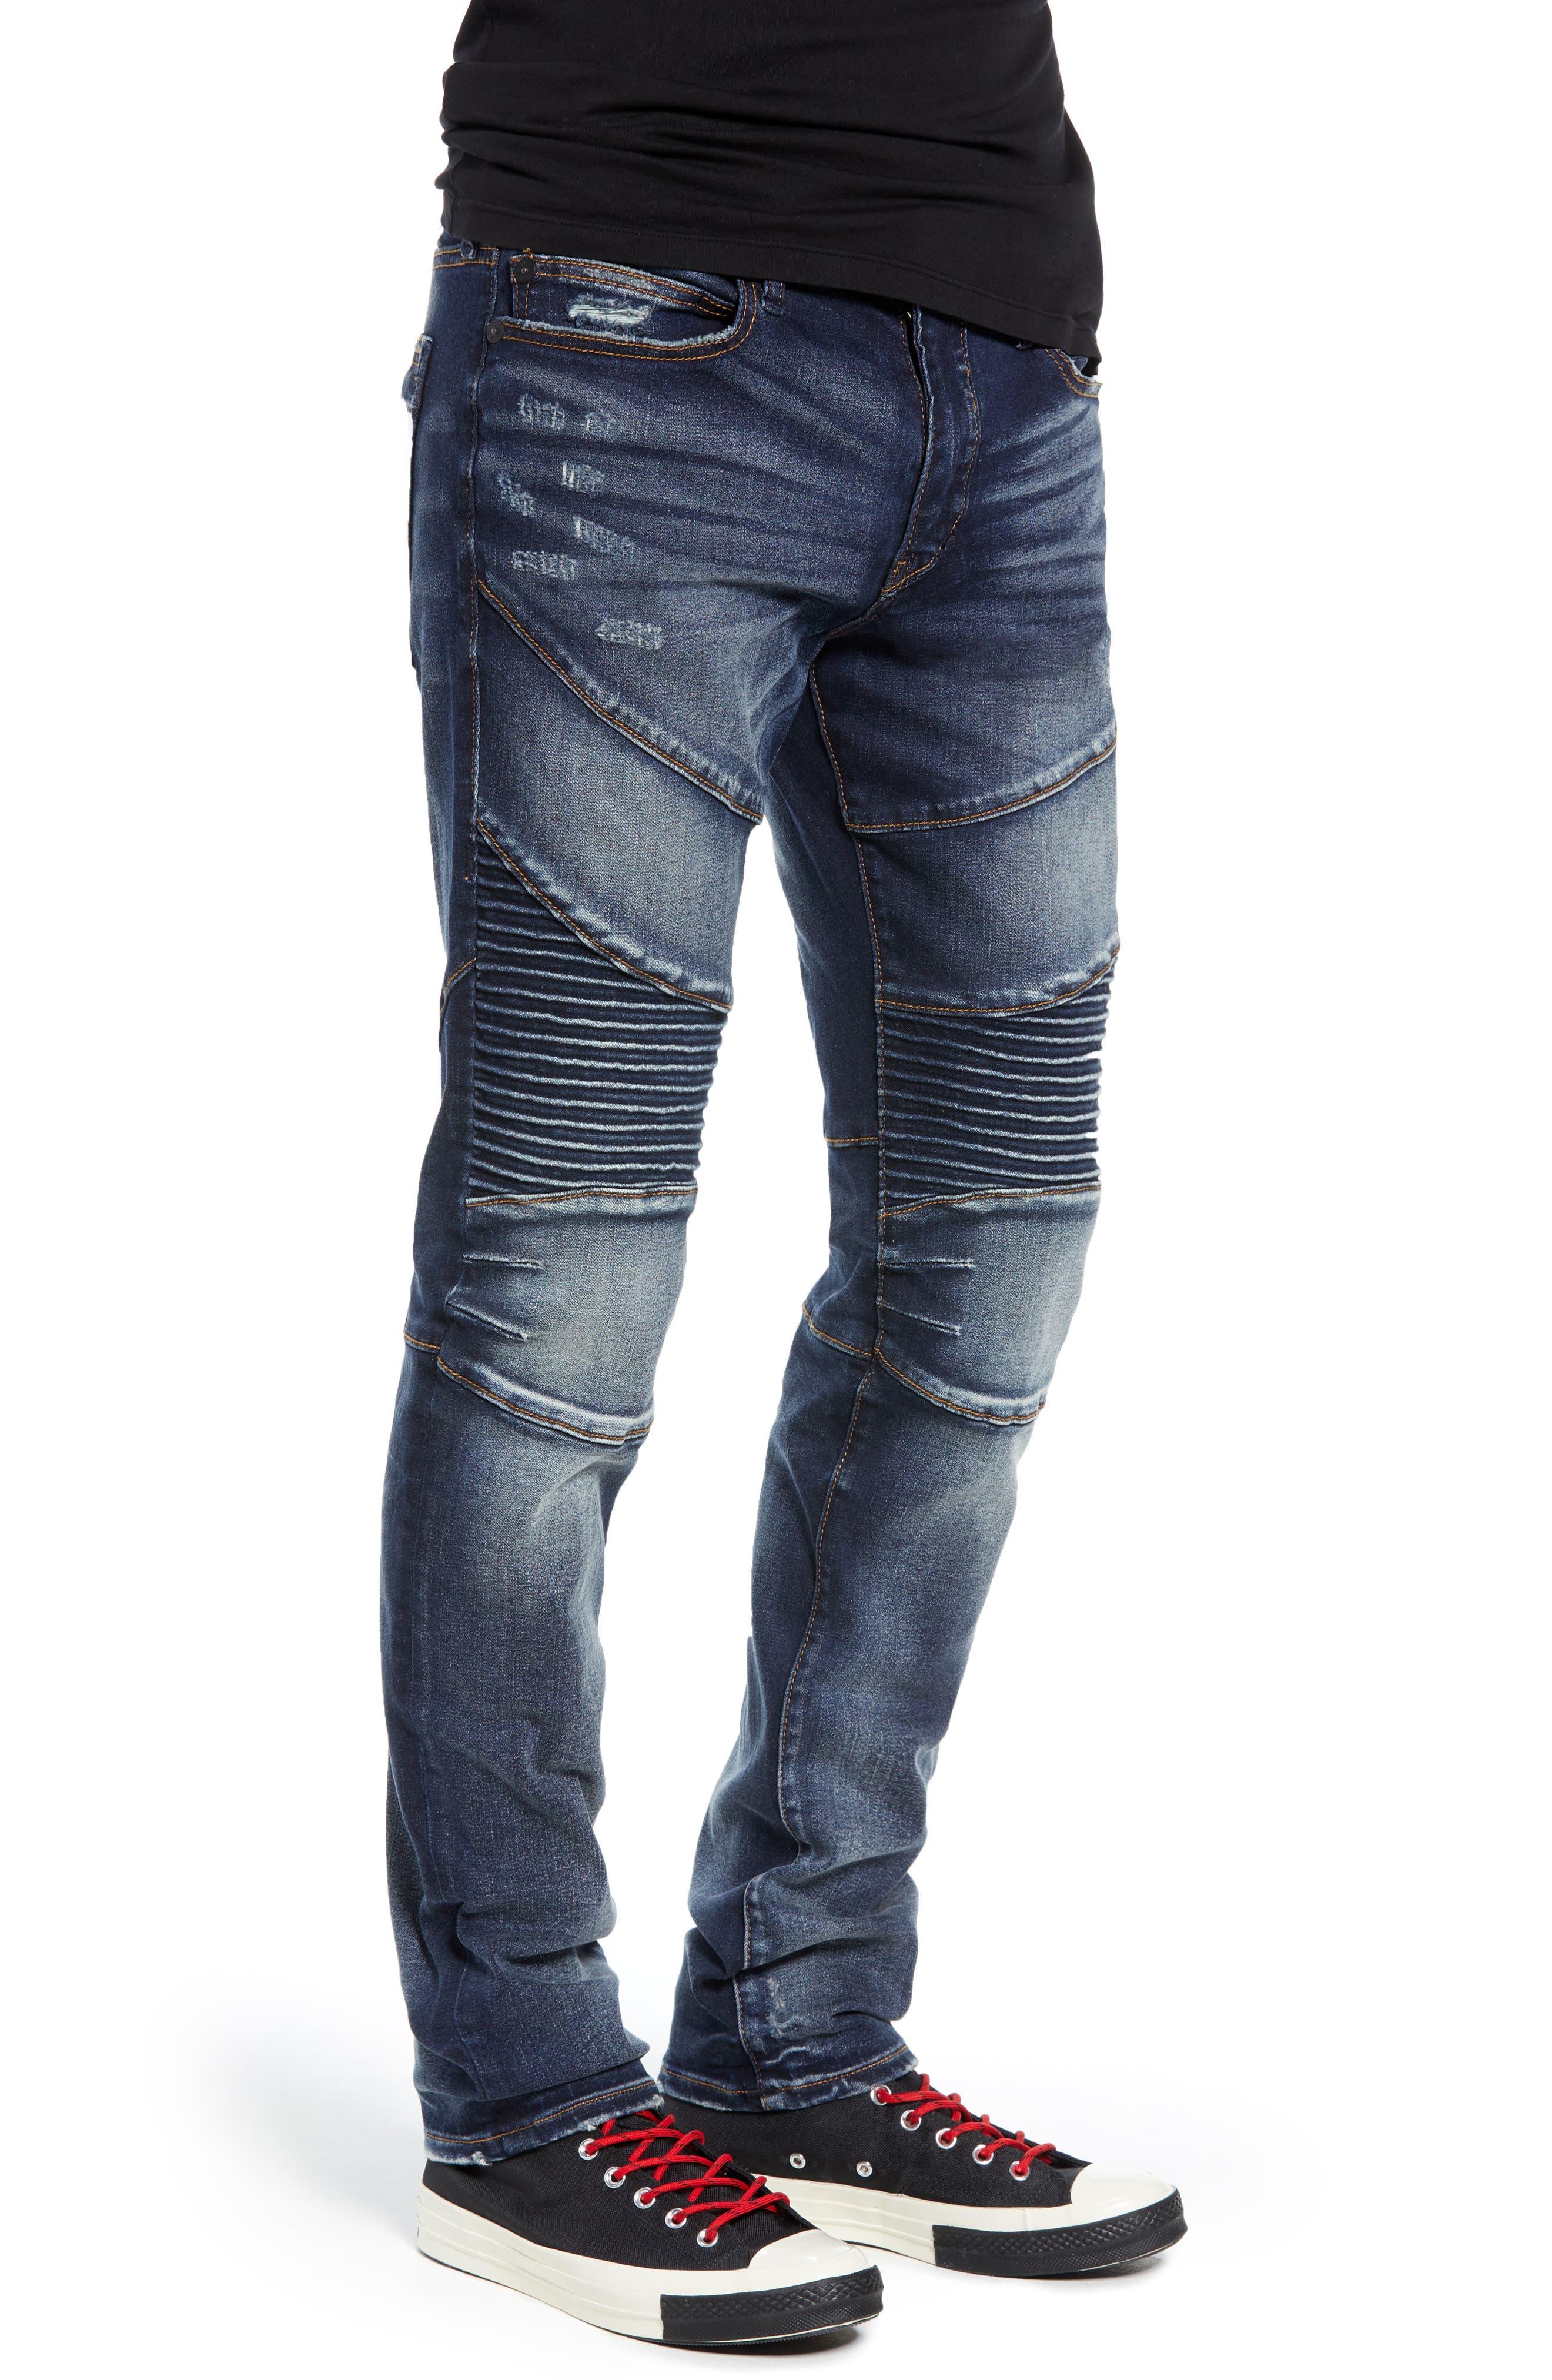 Rocco Skinny Fit Moto Jeans,                             Alternate thumbnail 3, color,                             MINERAL ASPHALT